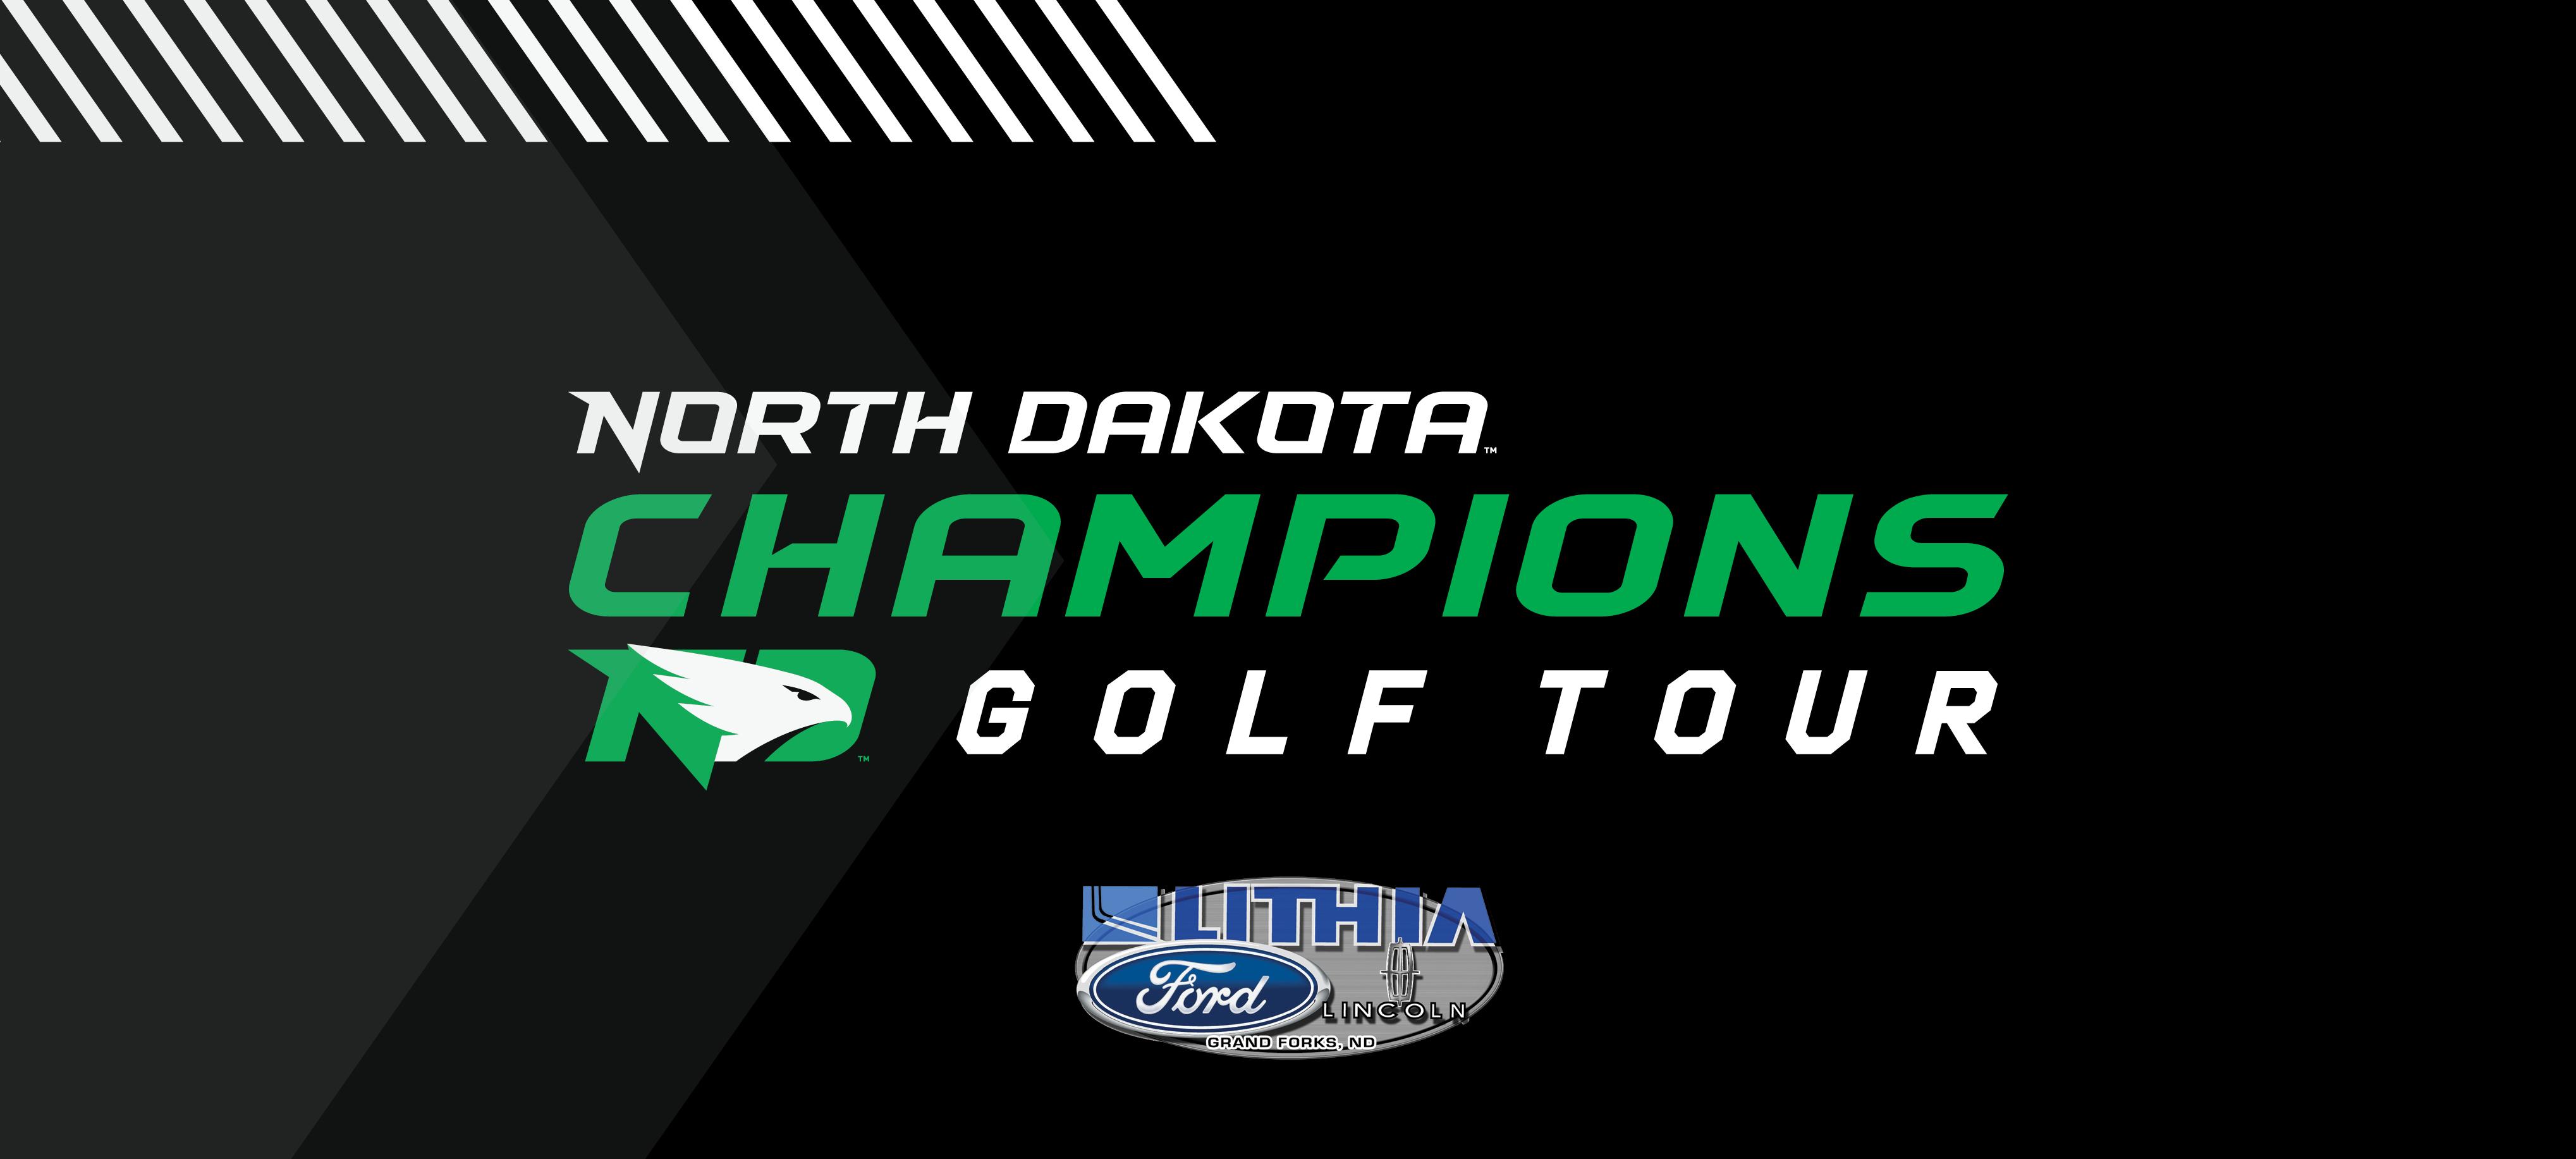 2018 Champions Golf Tour